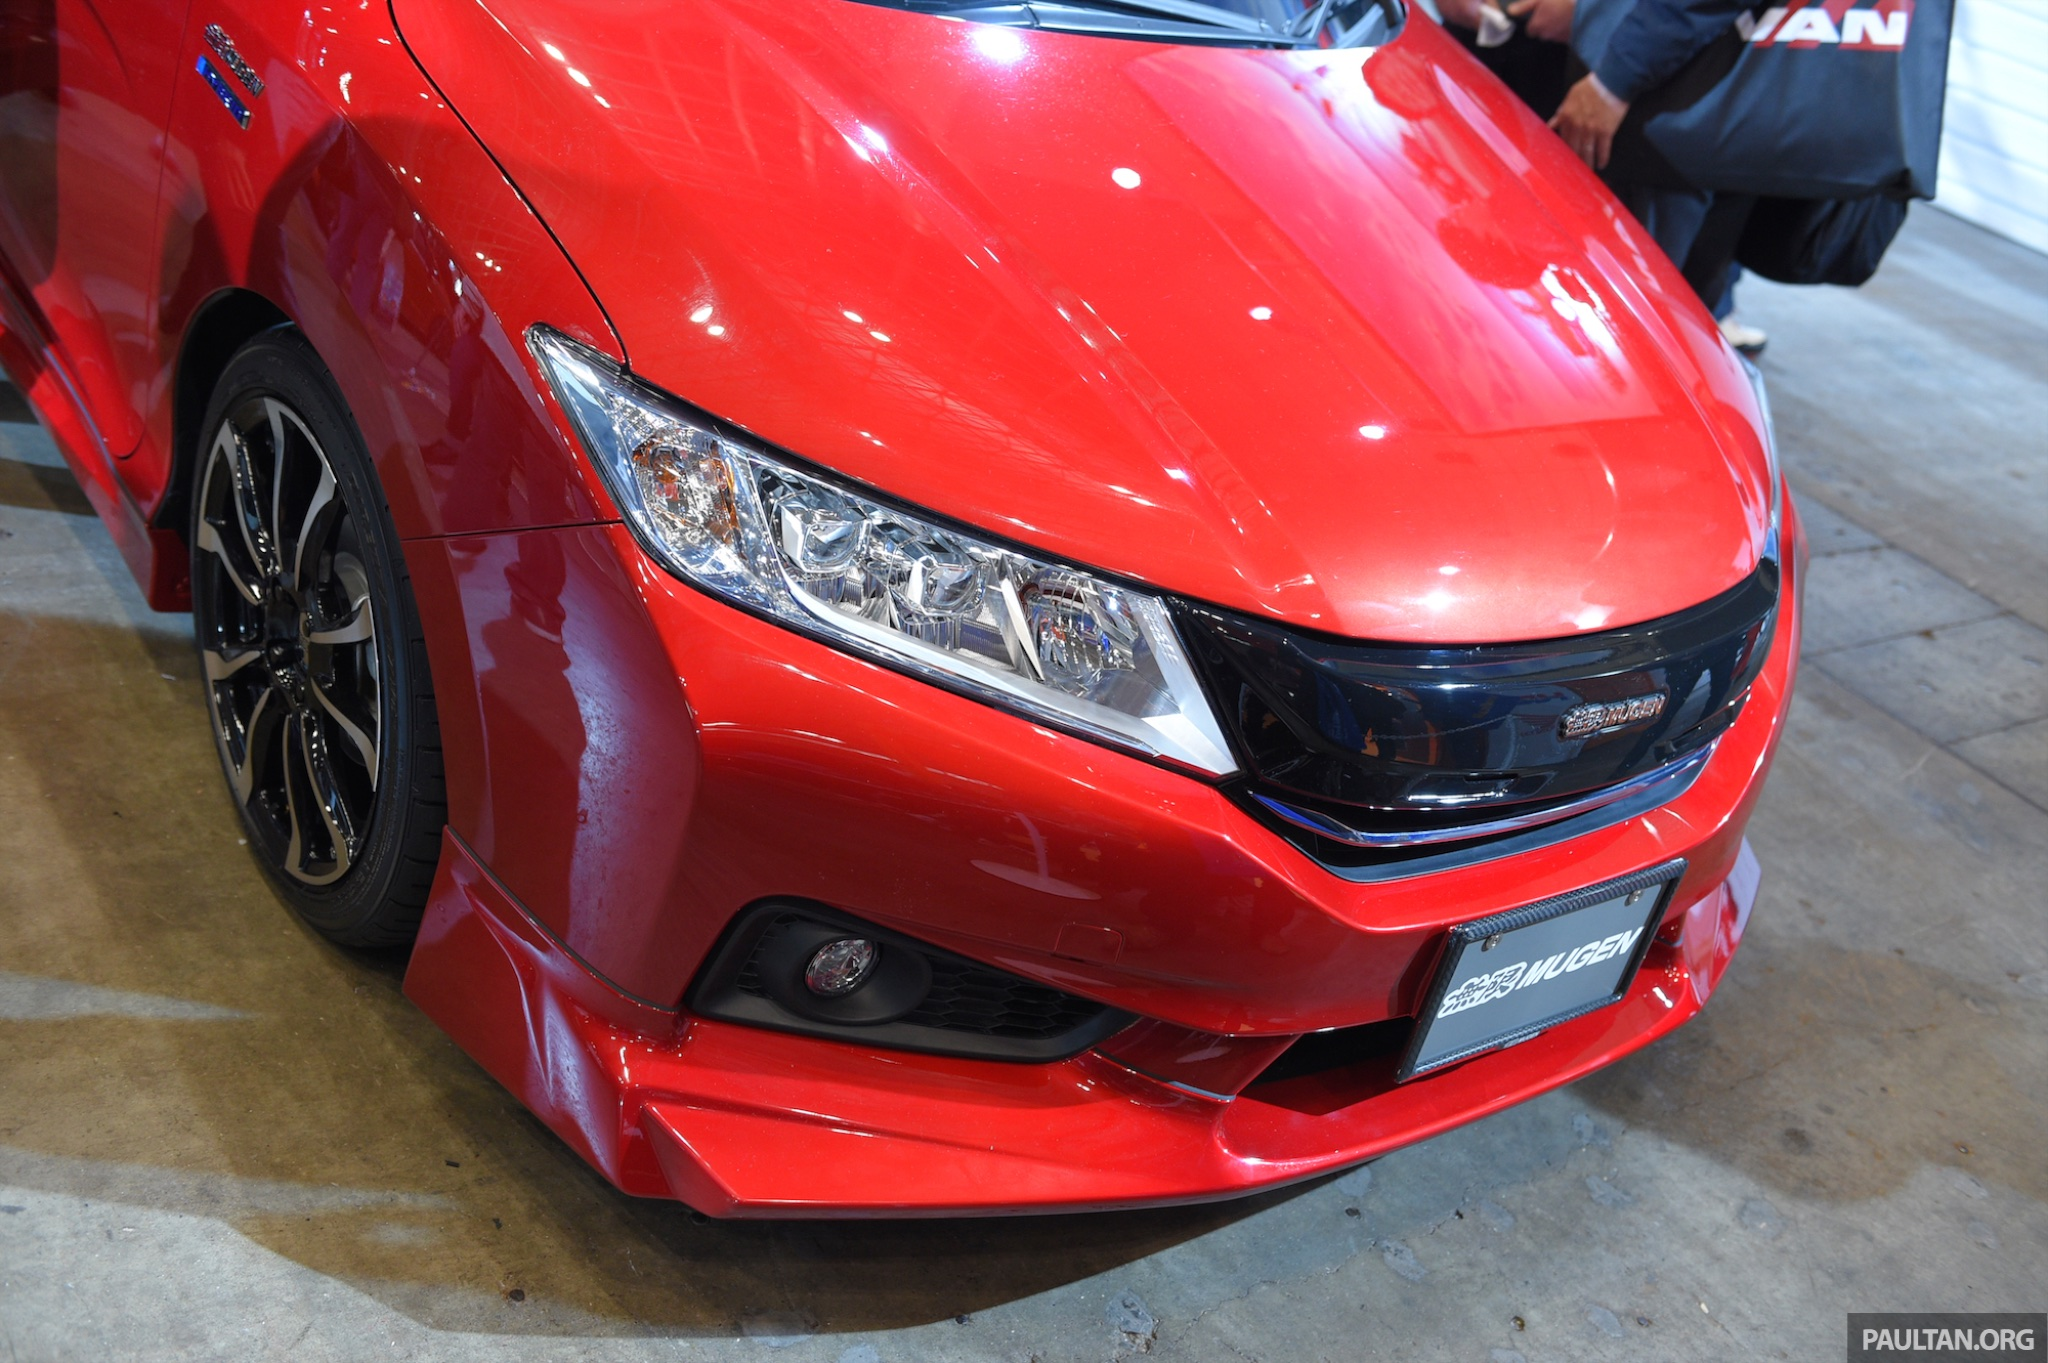 Auto Shows 2015 >> Mugen shows off pimped up Honda Grace (City Hybrid) at 2015 Tokyo Auto Salon Image 301992